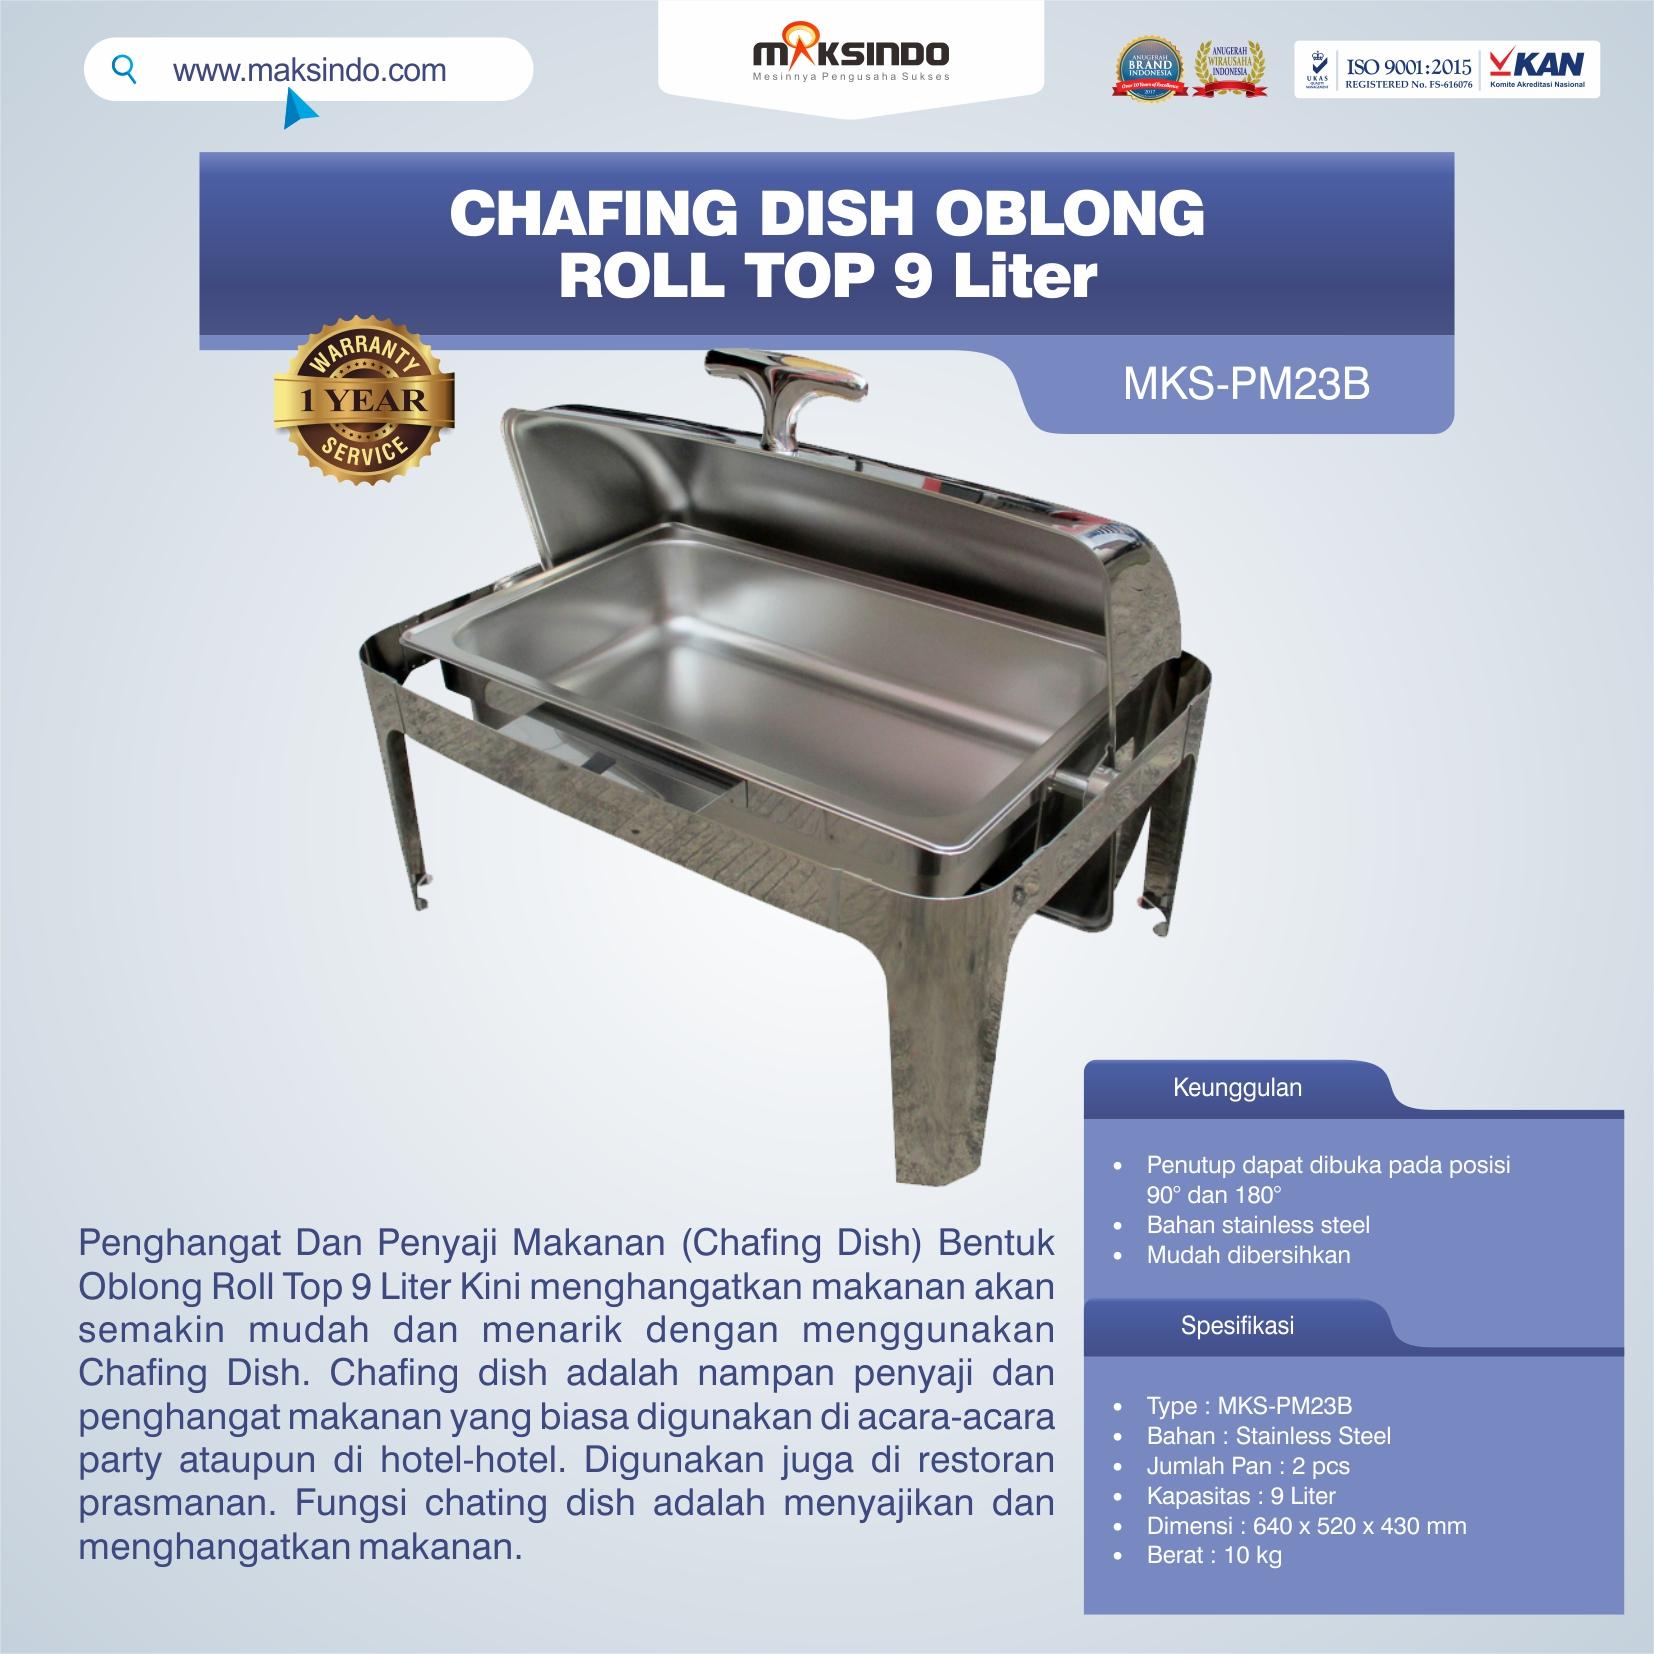 Jual Chafing Dish Oblong Roll Top – 9 Liter di Bogor